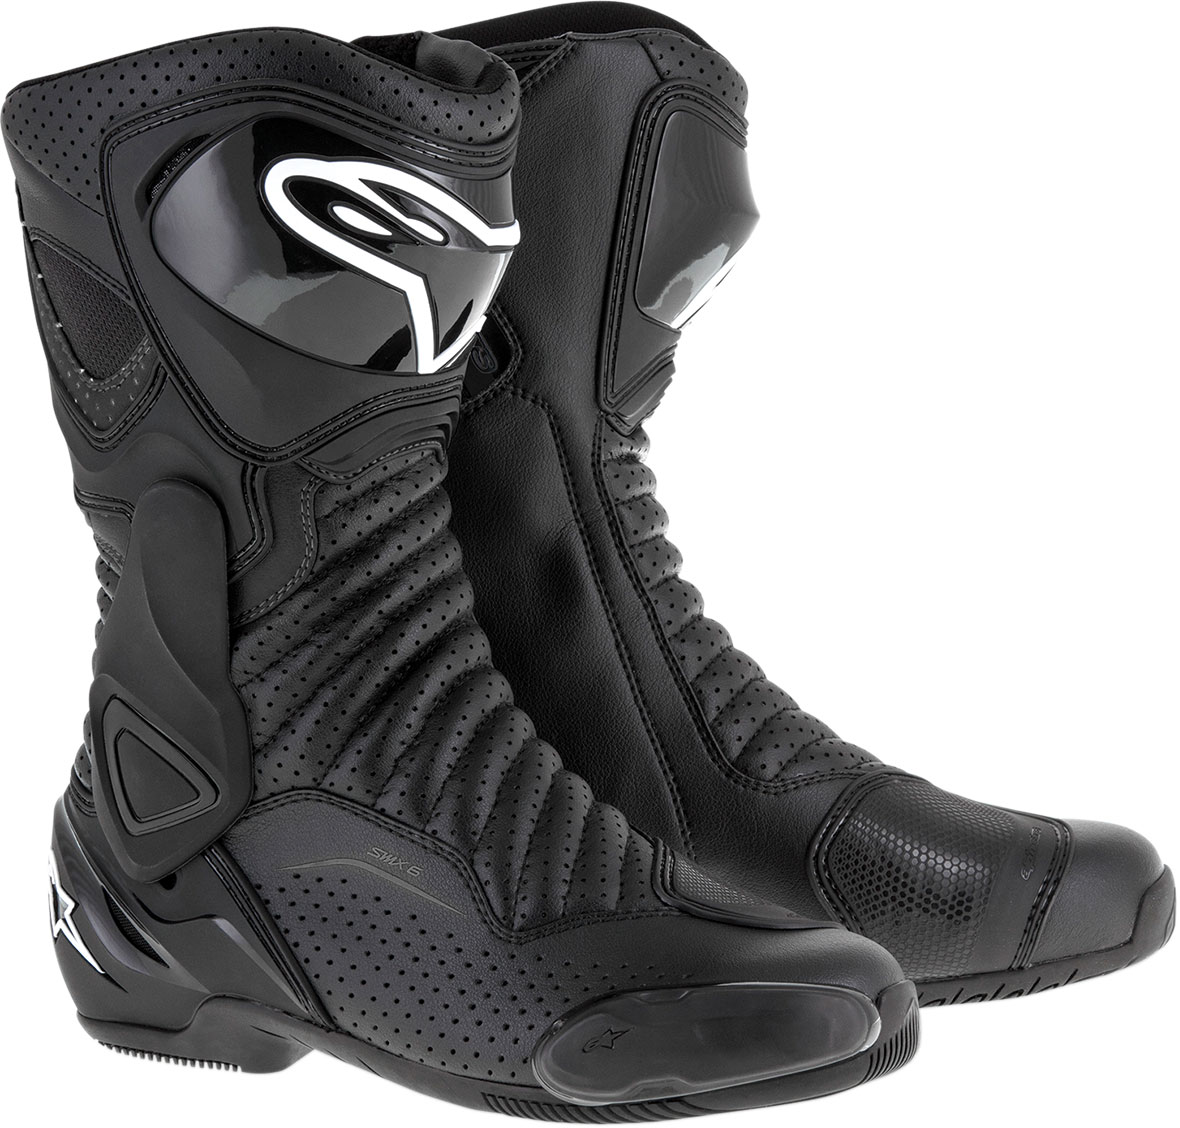 Alpinestars SMX-6 V2 Vented Road/Track Motorcycle Boots (Black)